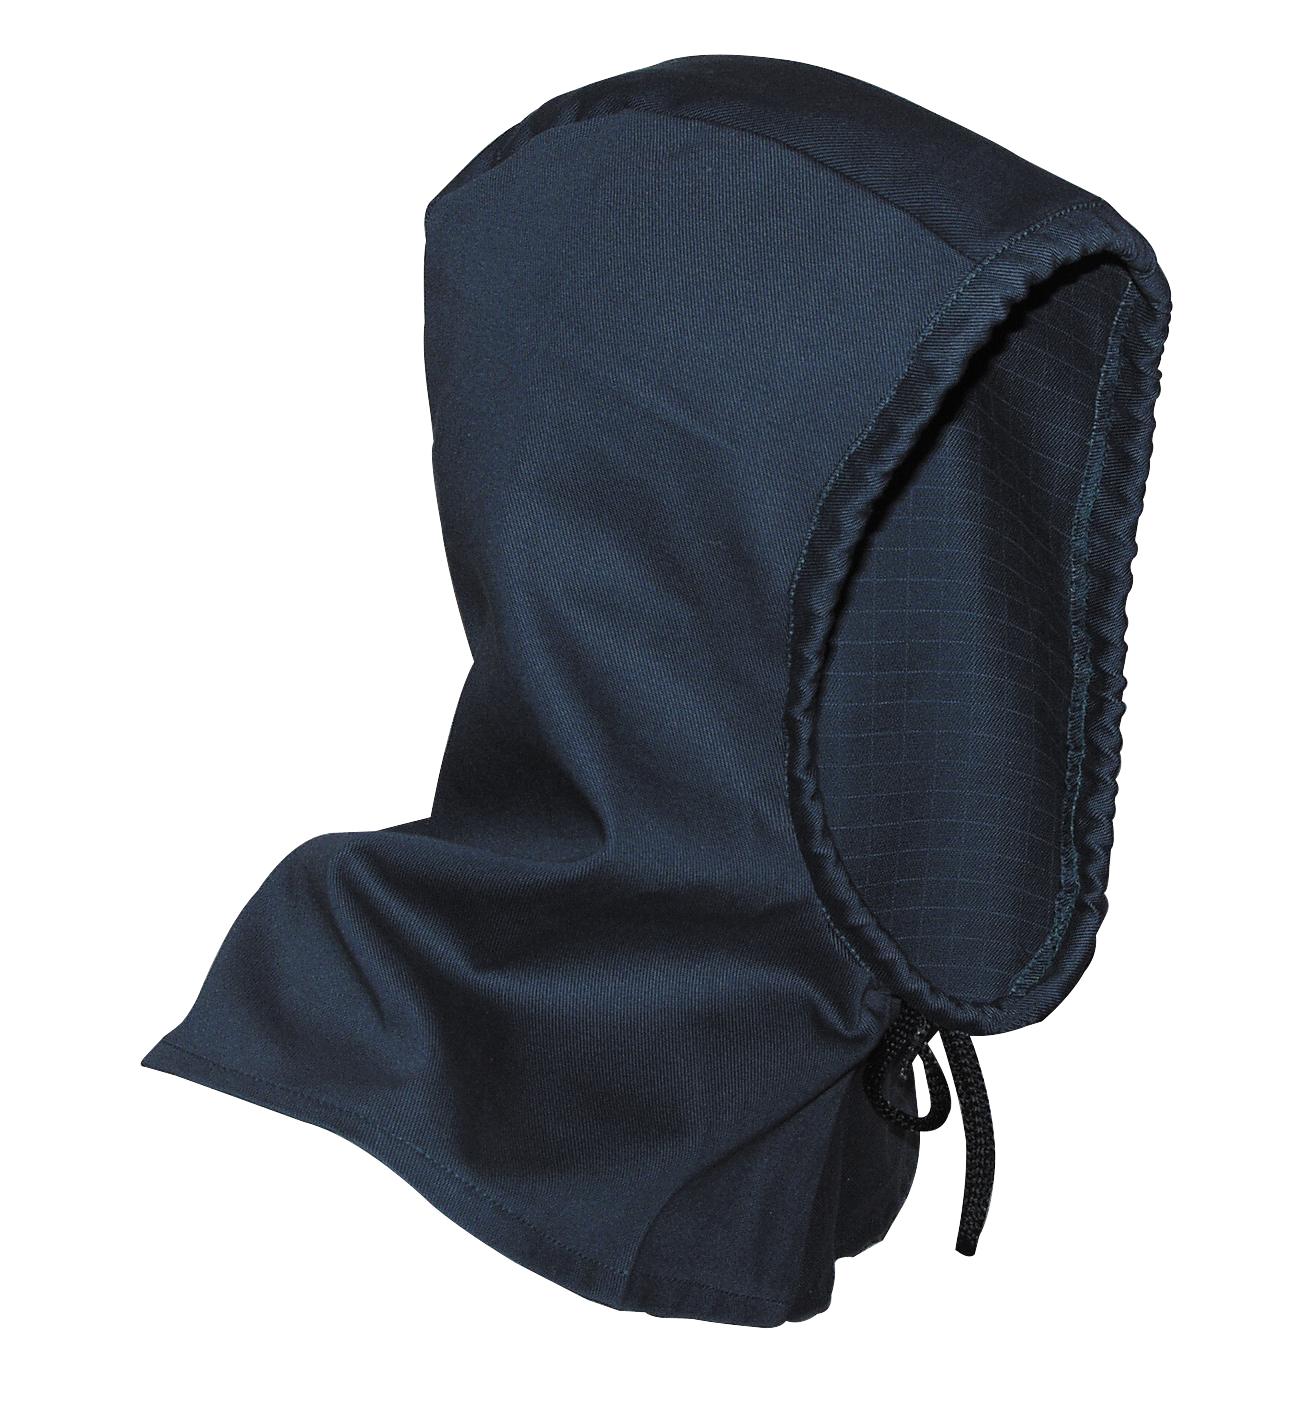 Cagoule coton ignifugé E5260-102 EDC Protection